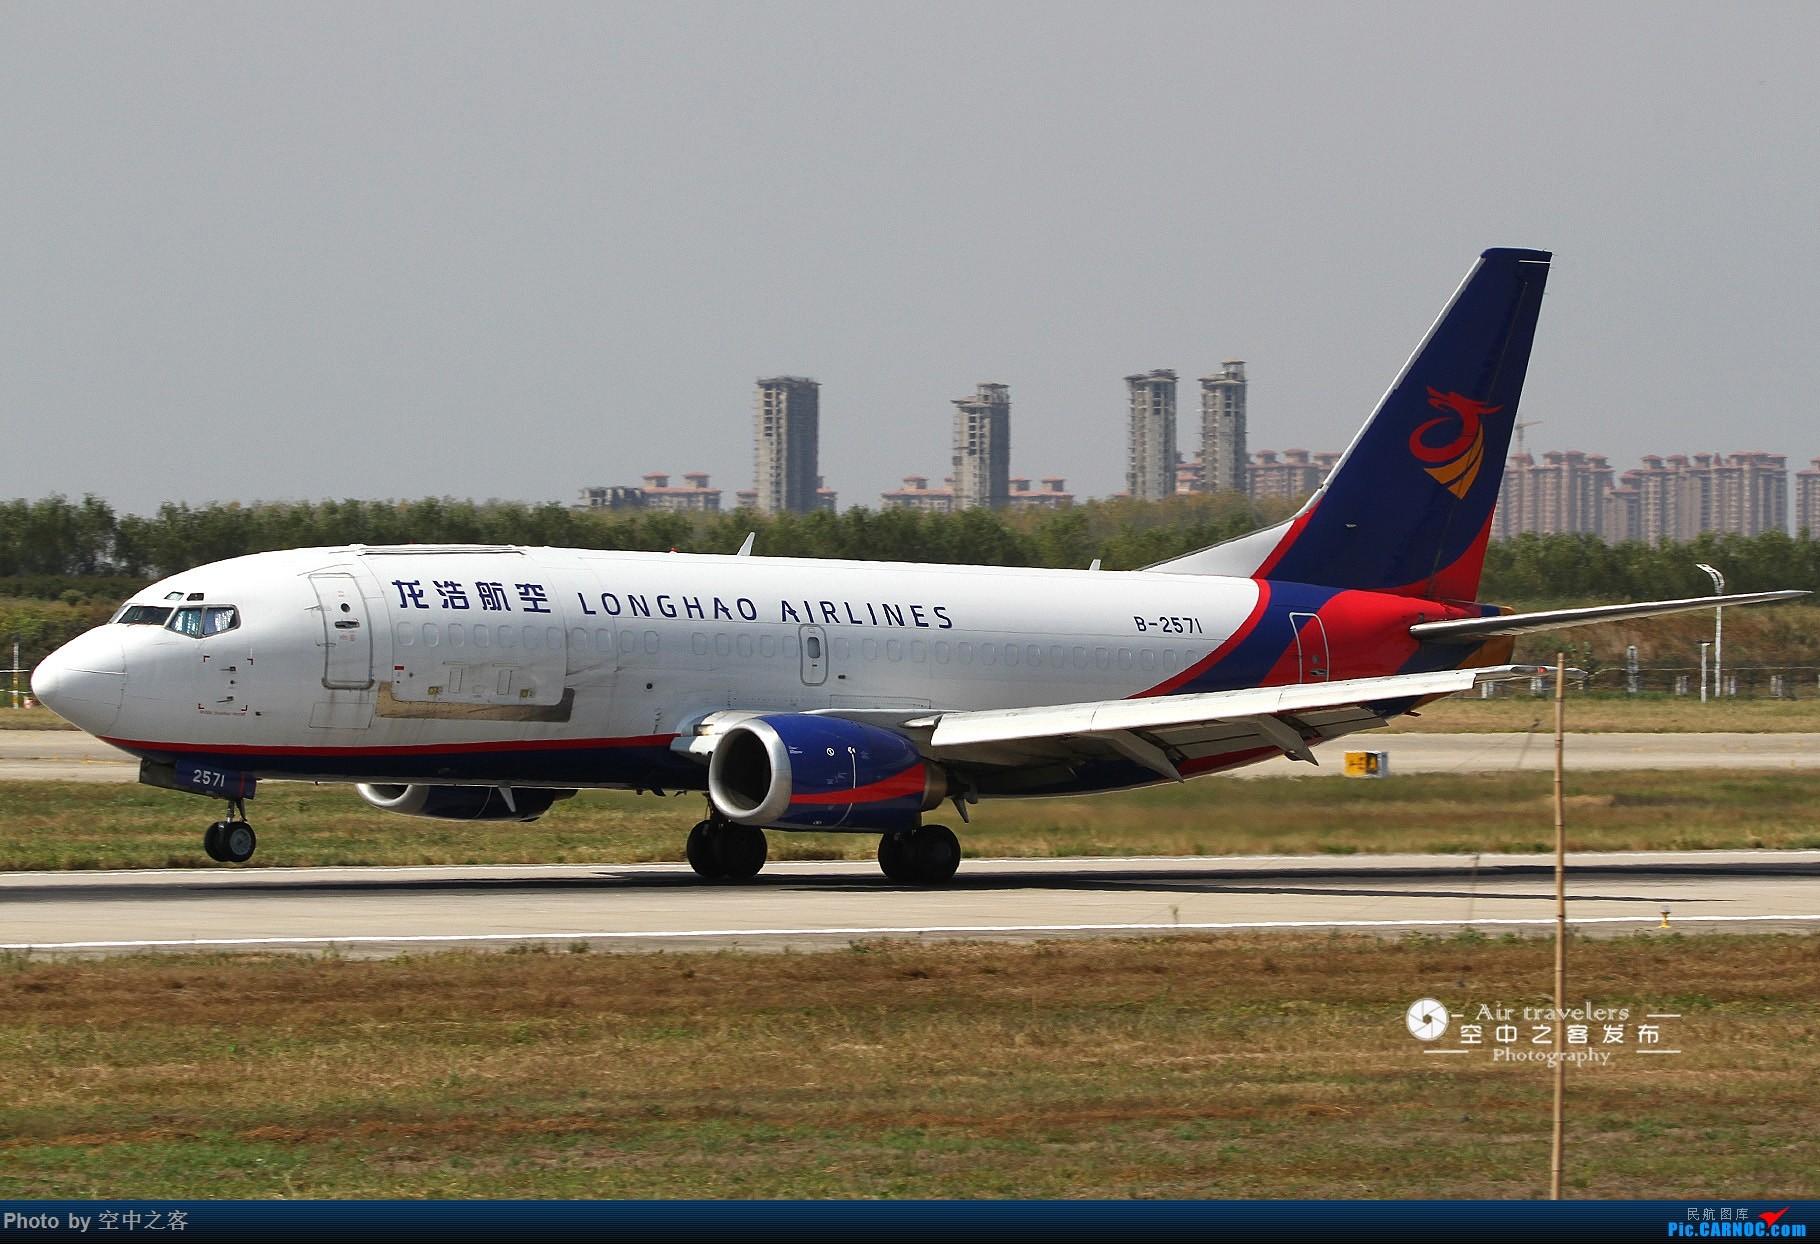 Re:[原创][霸都打机队 空中之客发布]龙浩航空波音733自改货机新桥机场本场... BOEING 737-300 B-2571 合肥新桥国际机场